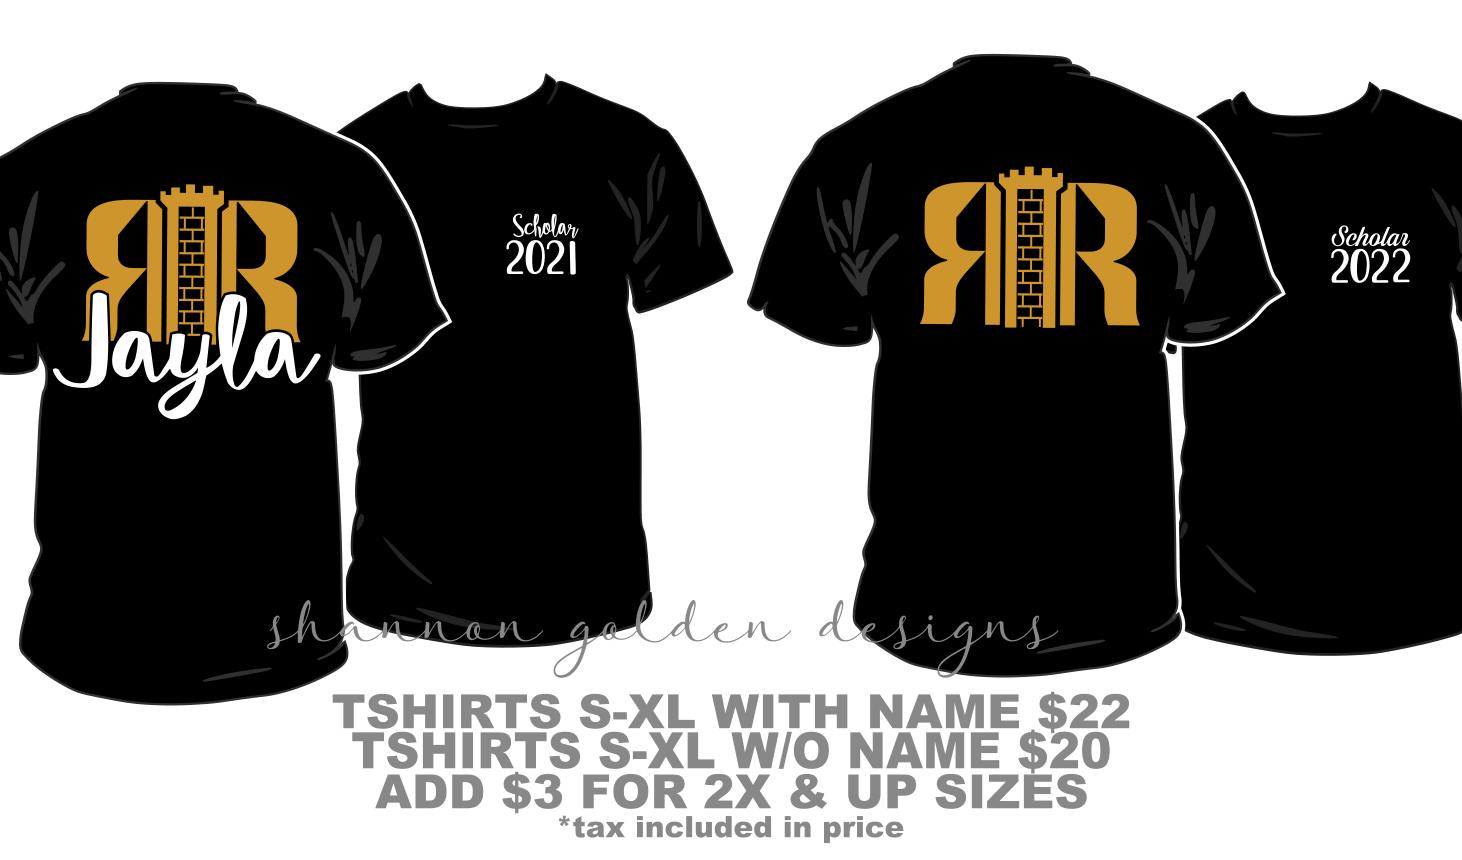 RRHS Early College Tshirt